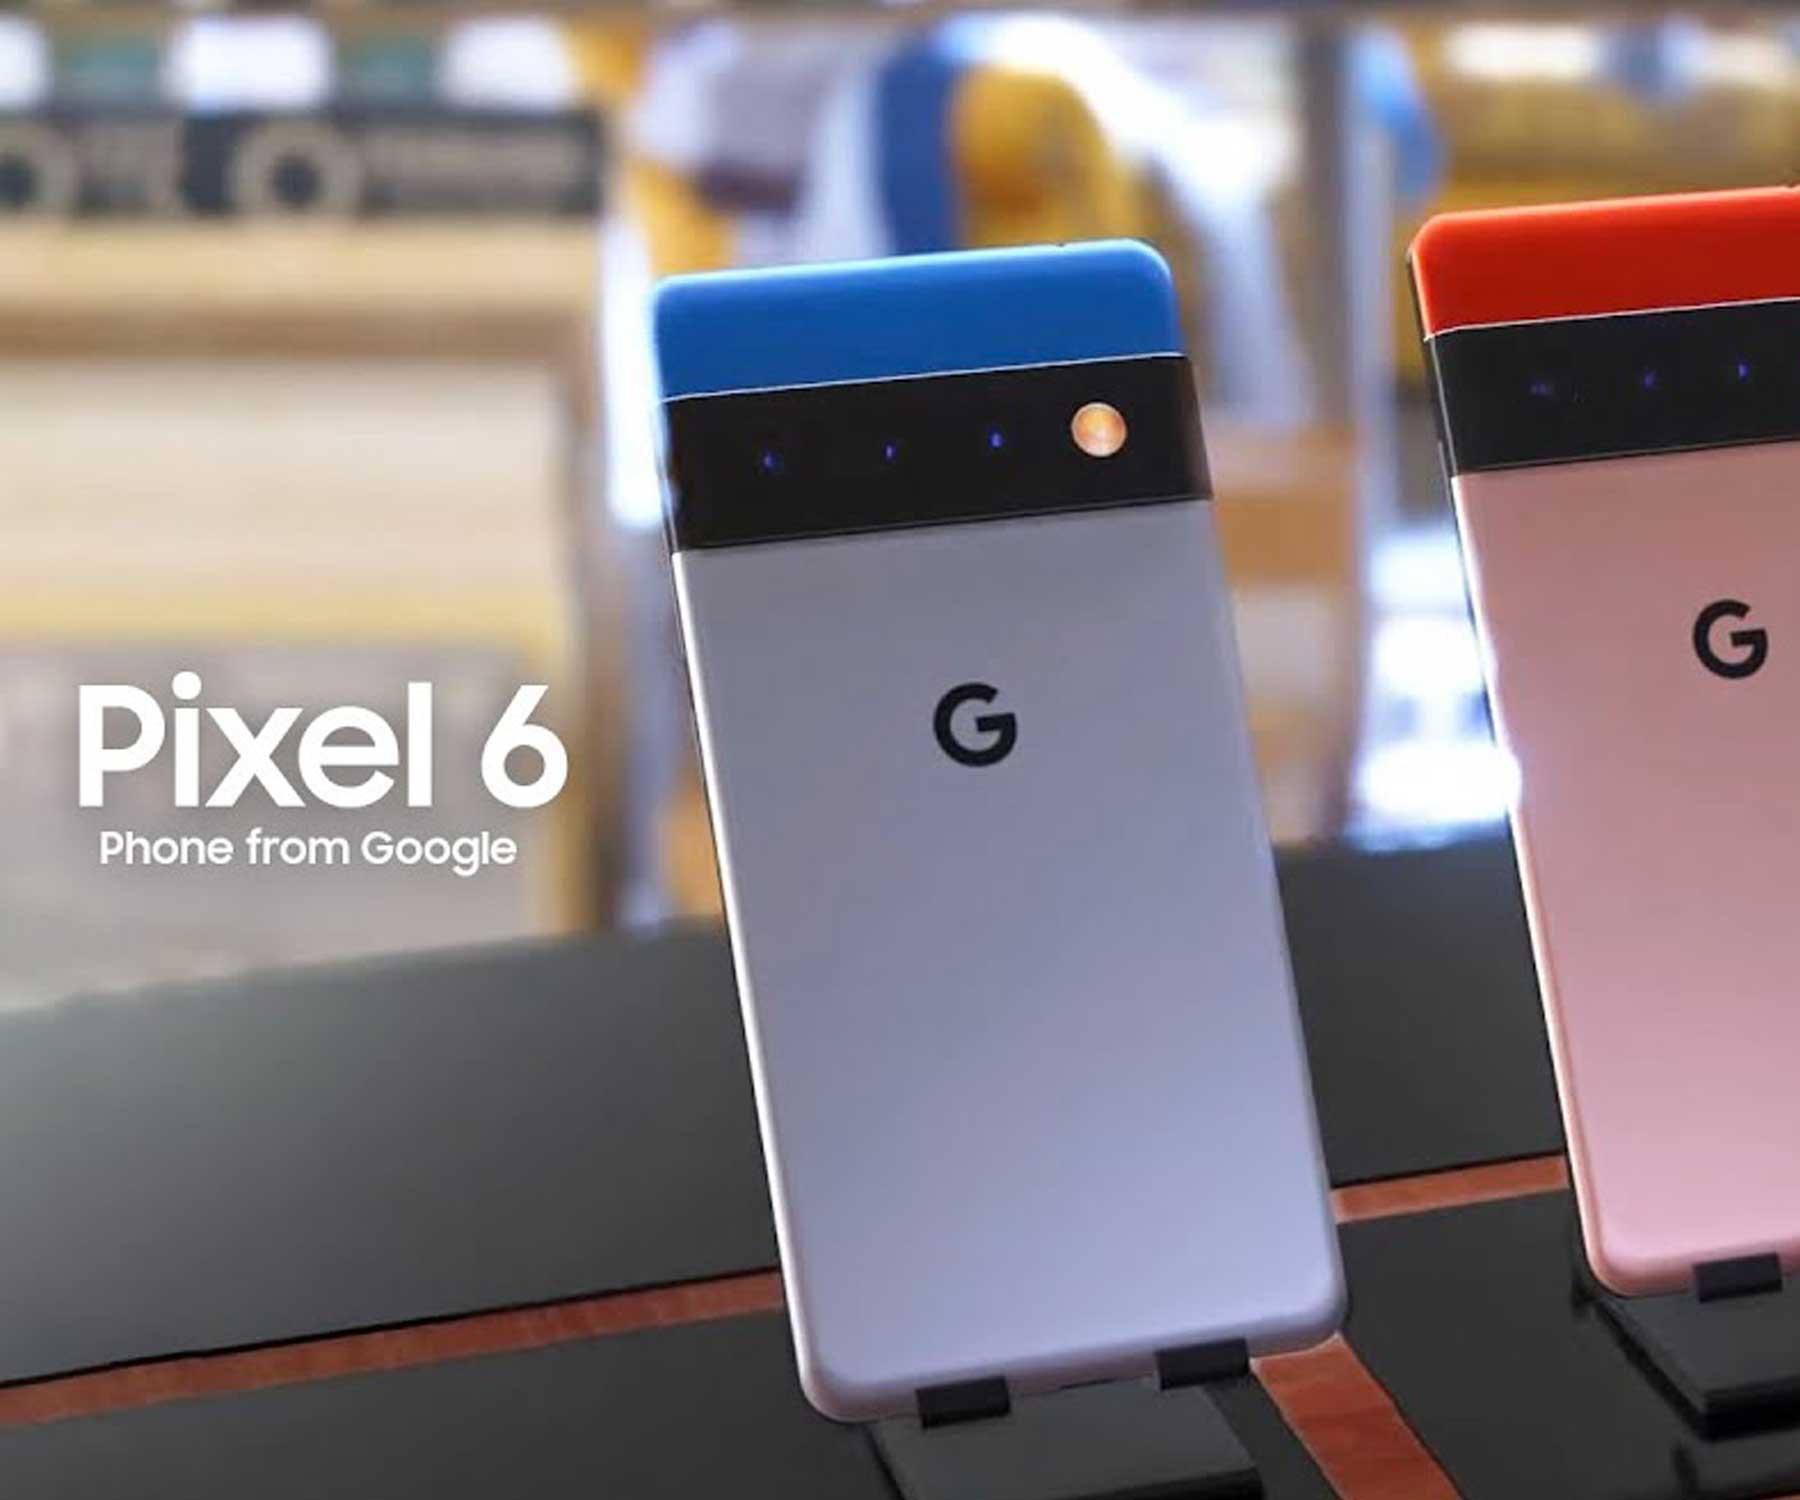 Google Pixel 6 Pro а∂Еа∂±аЈКа∂≠а∂їаЈКа∂¢аЈПа∂ља∂Ї аЈДа∂їаЈДаЈП Leak аЈАаЈЩа∂ЇаЈТ. ( Video )